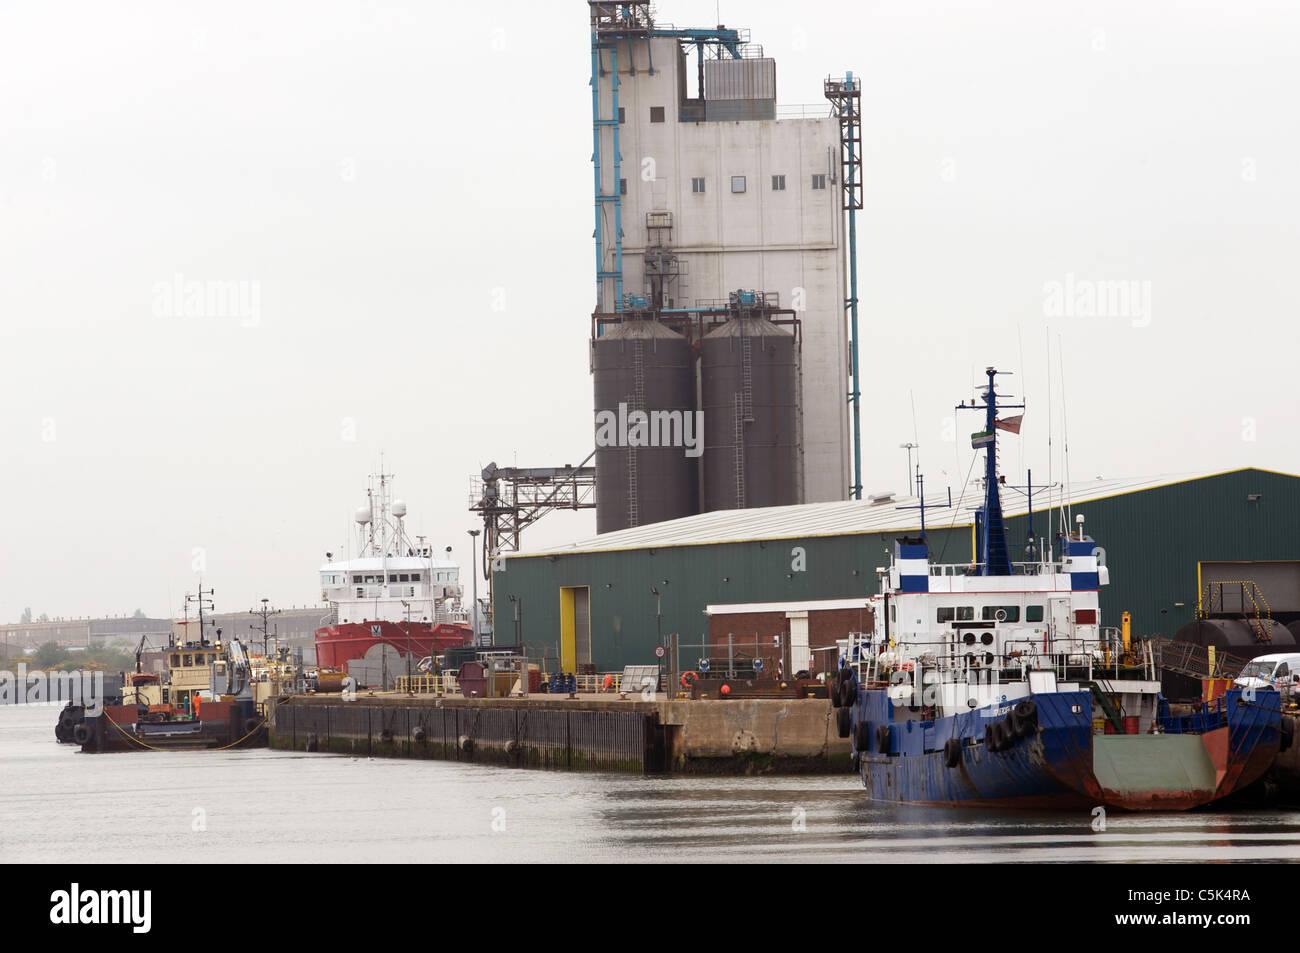 Port of Lowestoft, Suffolk, UK. - Stock Image